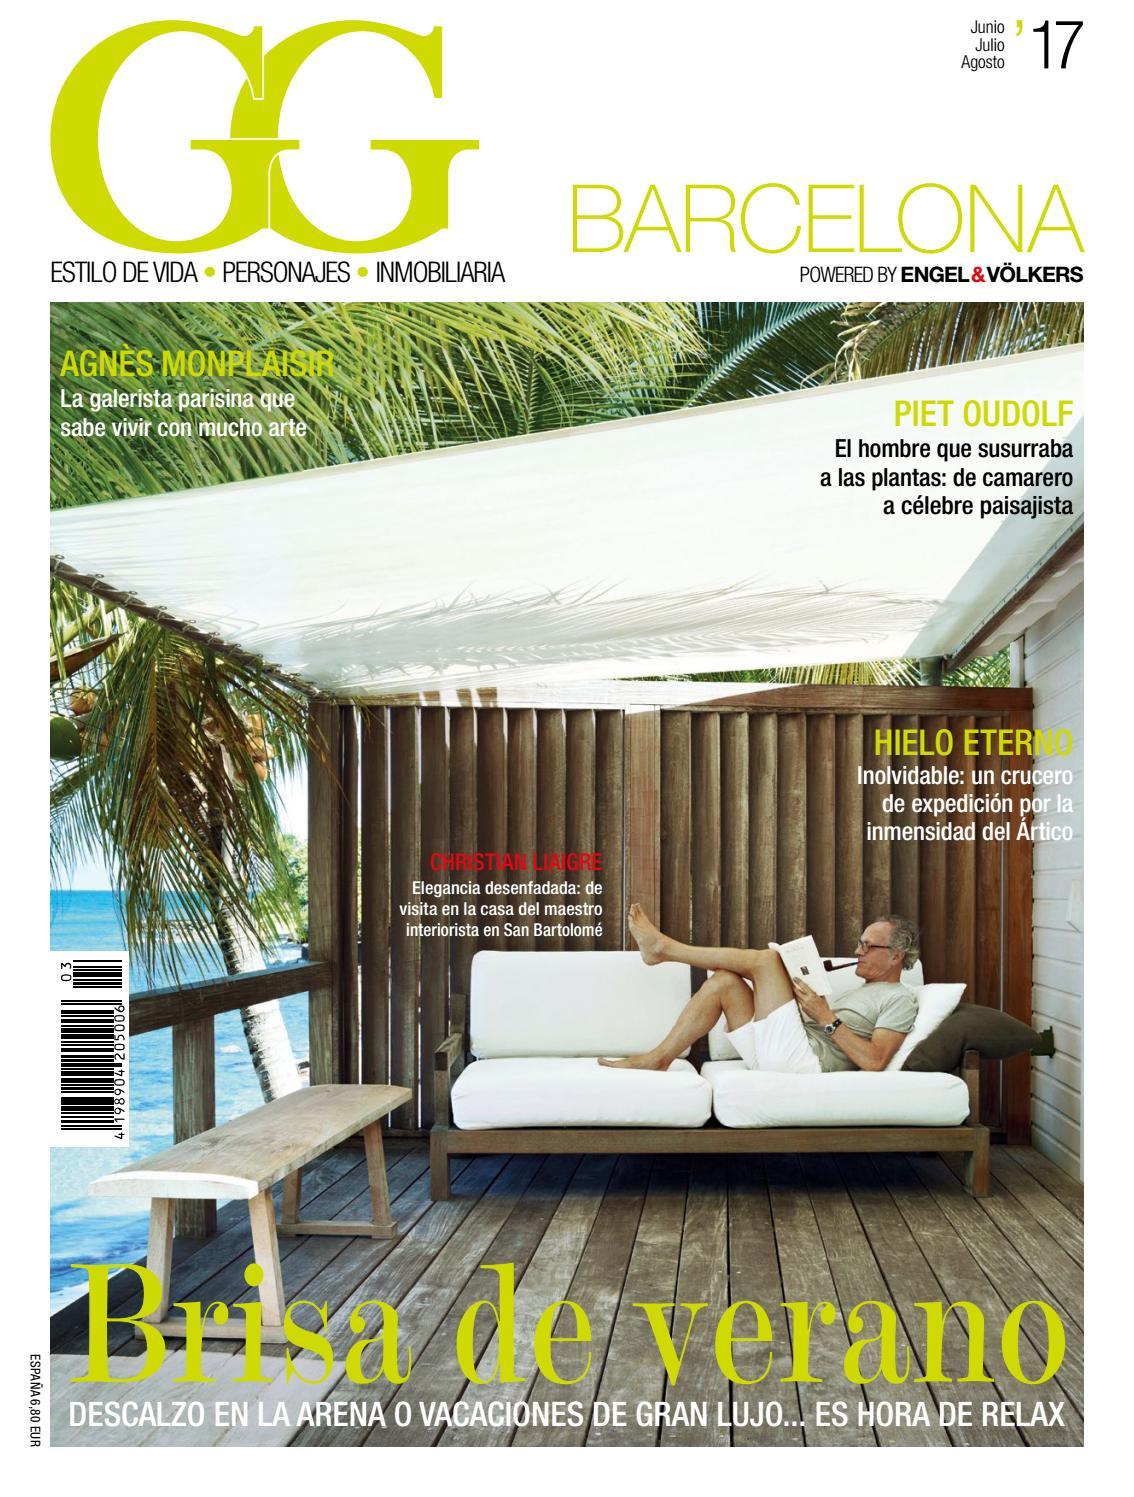 GG Magazine 03/17 Barcelona by GG-Magazine - issuu